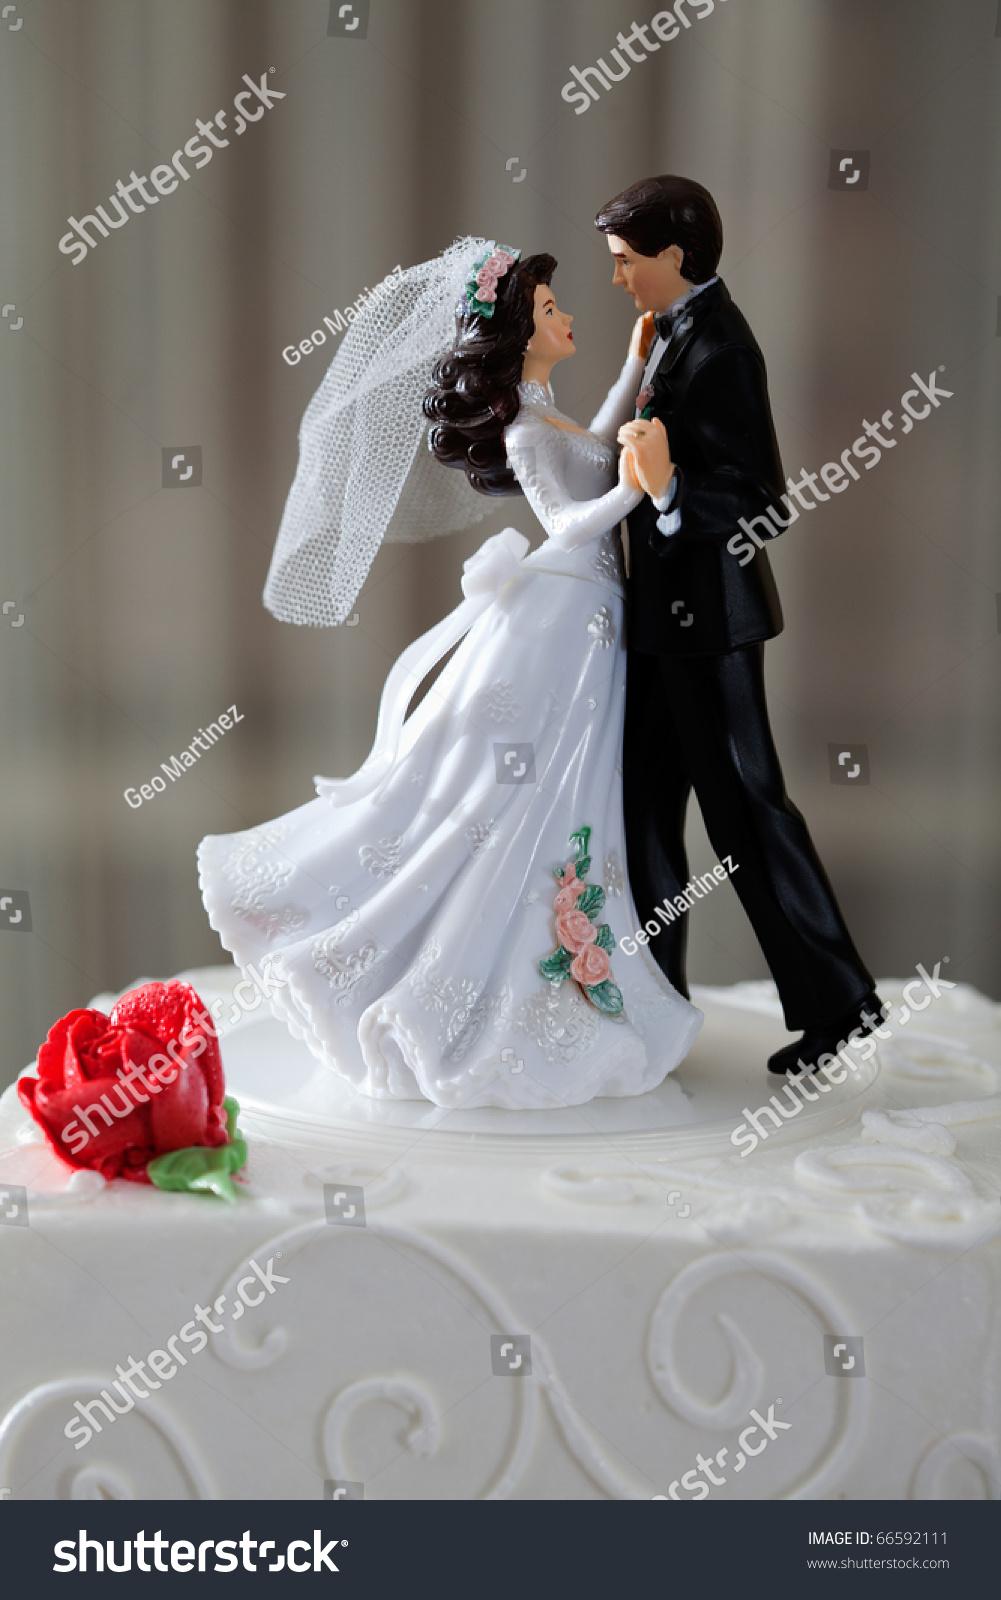 Romantic Dancing Couple Cake Topper